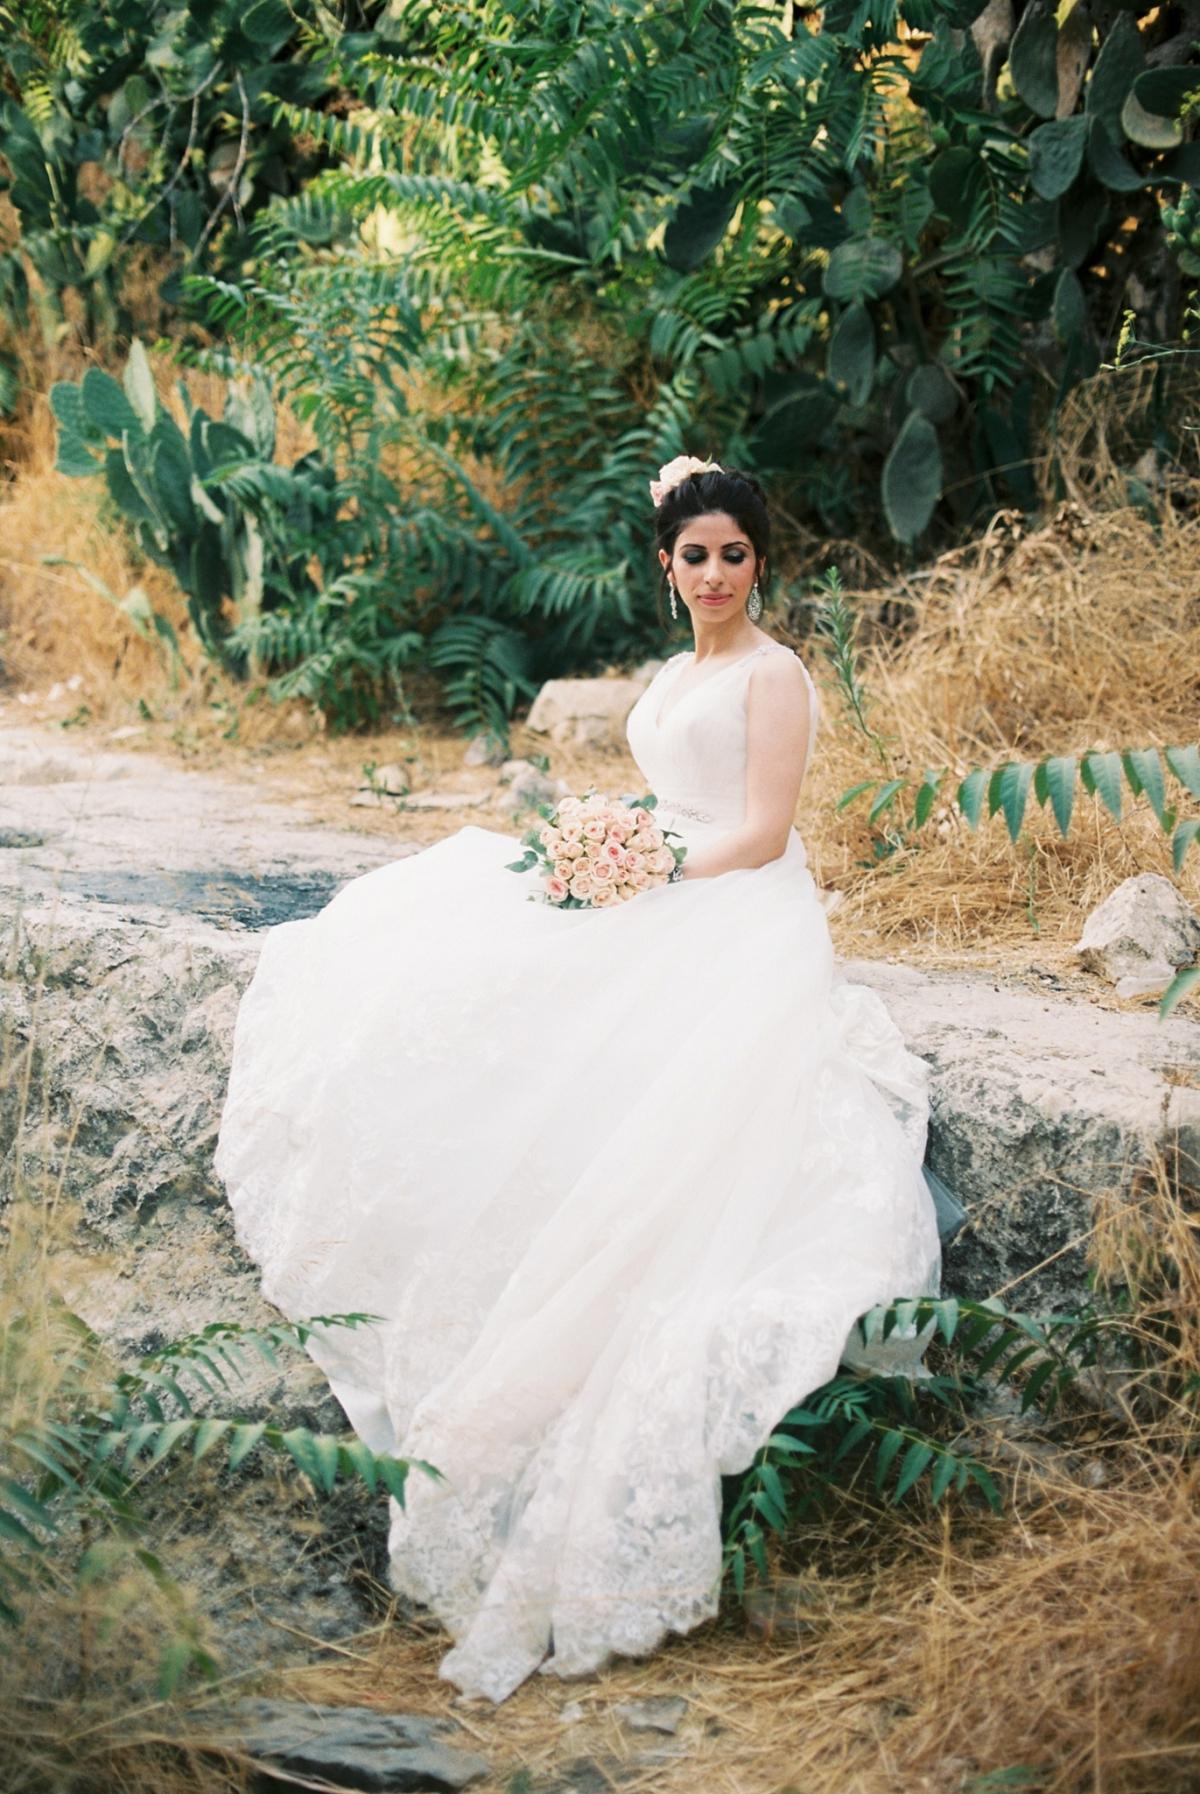 Lifta Bridal Portraits - Jerusalem Israel - Muna and Ali - Sigala Photography_0017